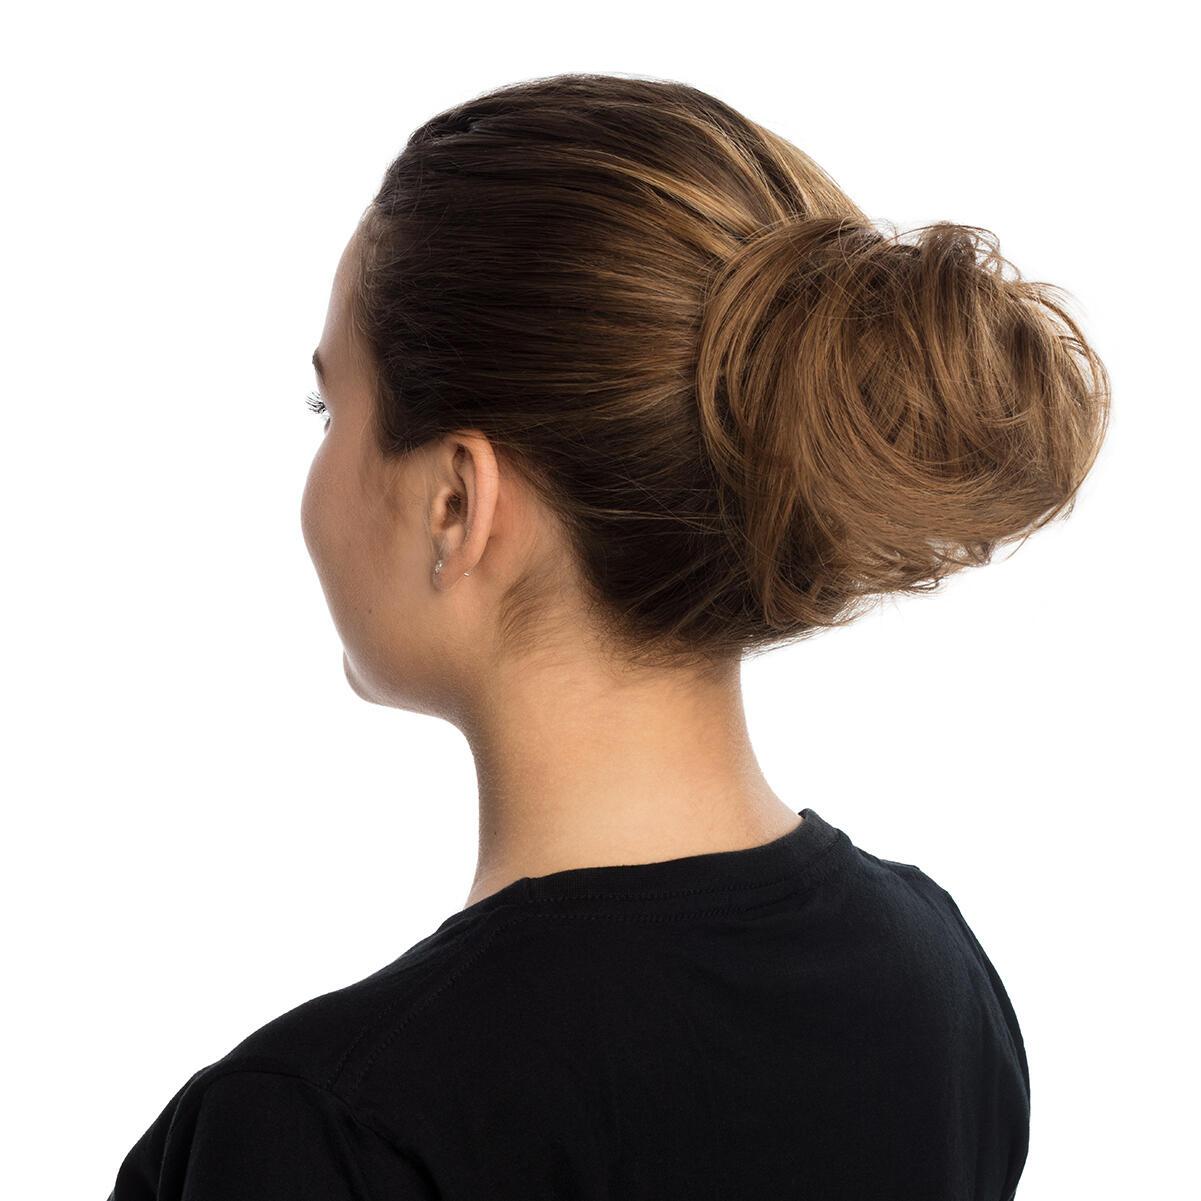 Hair Scrunchie M7.5/10.8 Scandinavian Blonde 0 cm